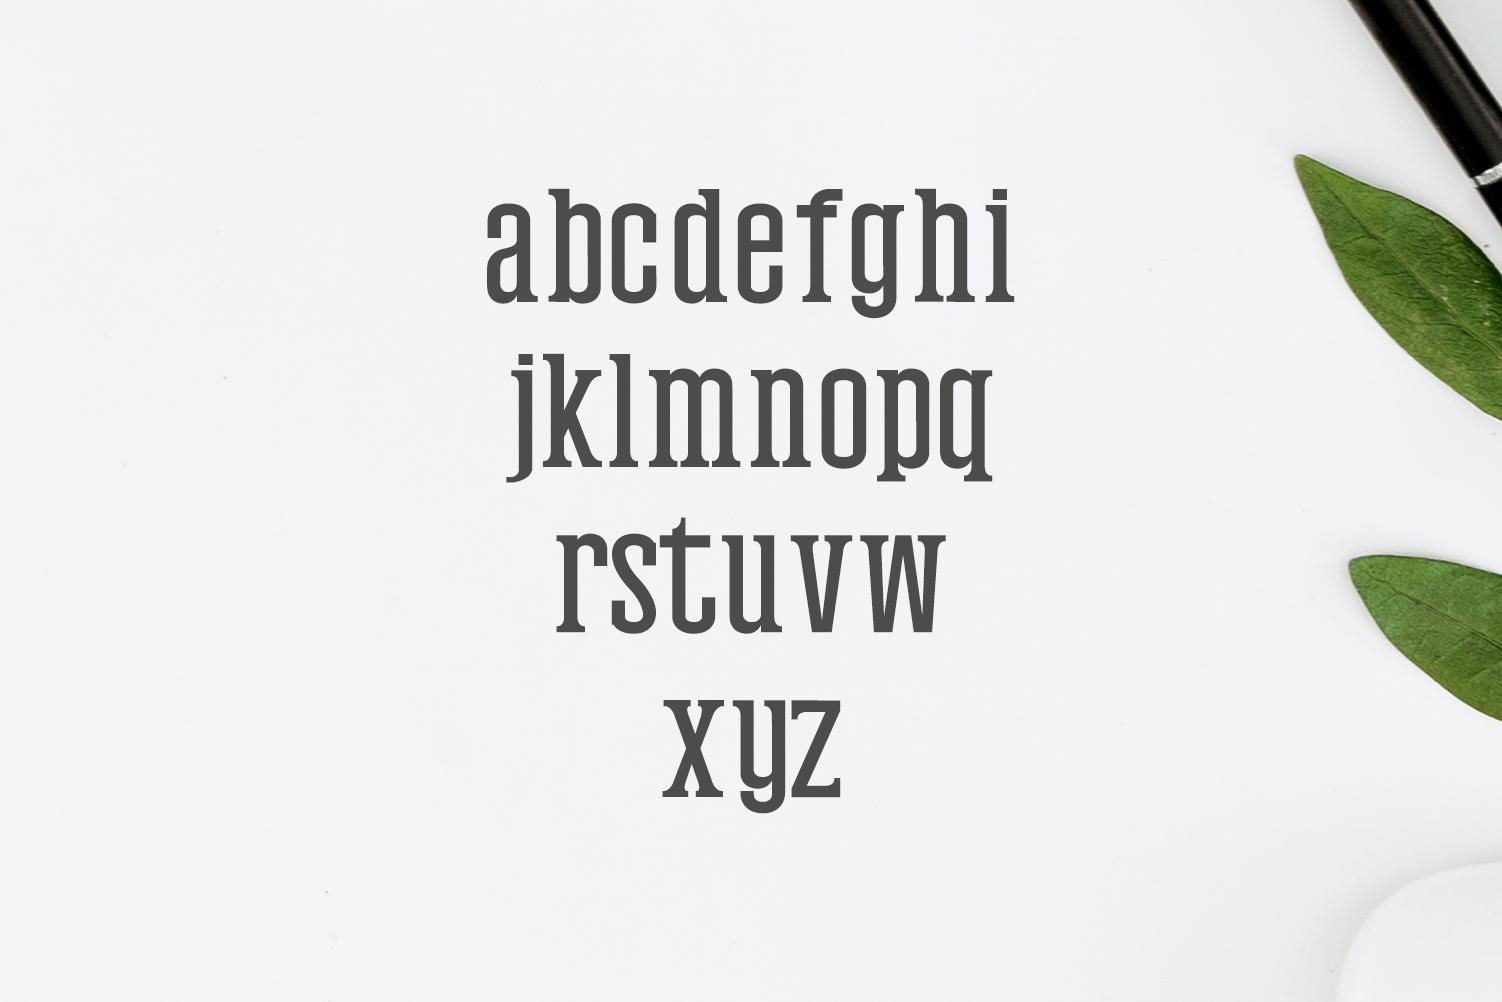 Mahlon Serif 3 Font Family Pack example image 4